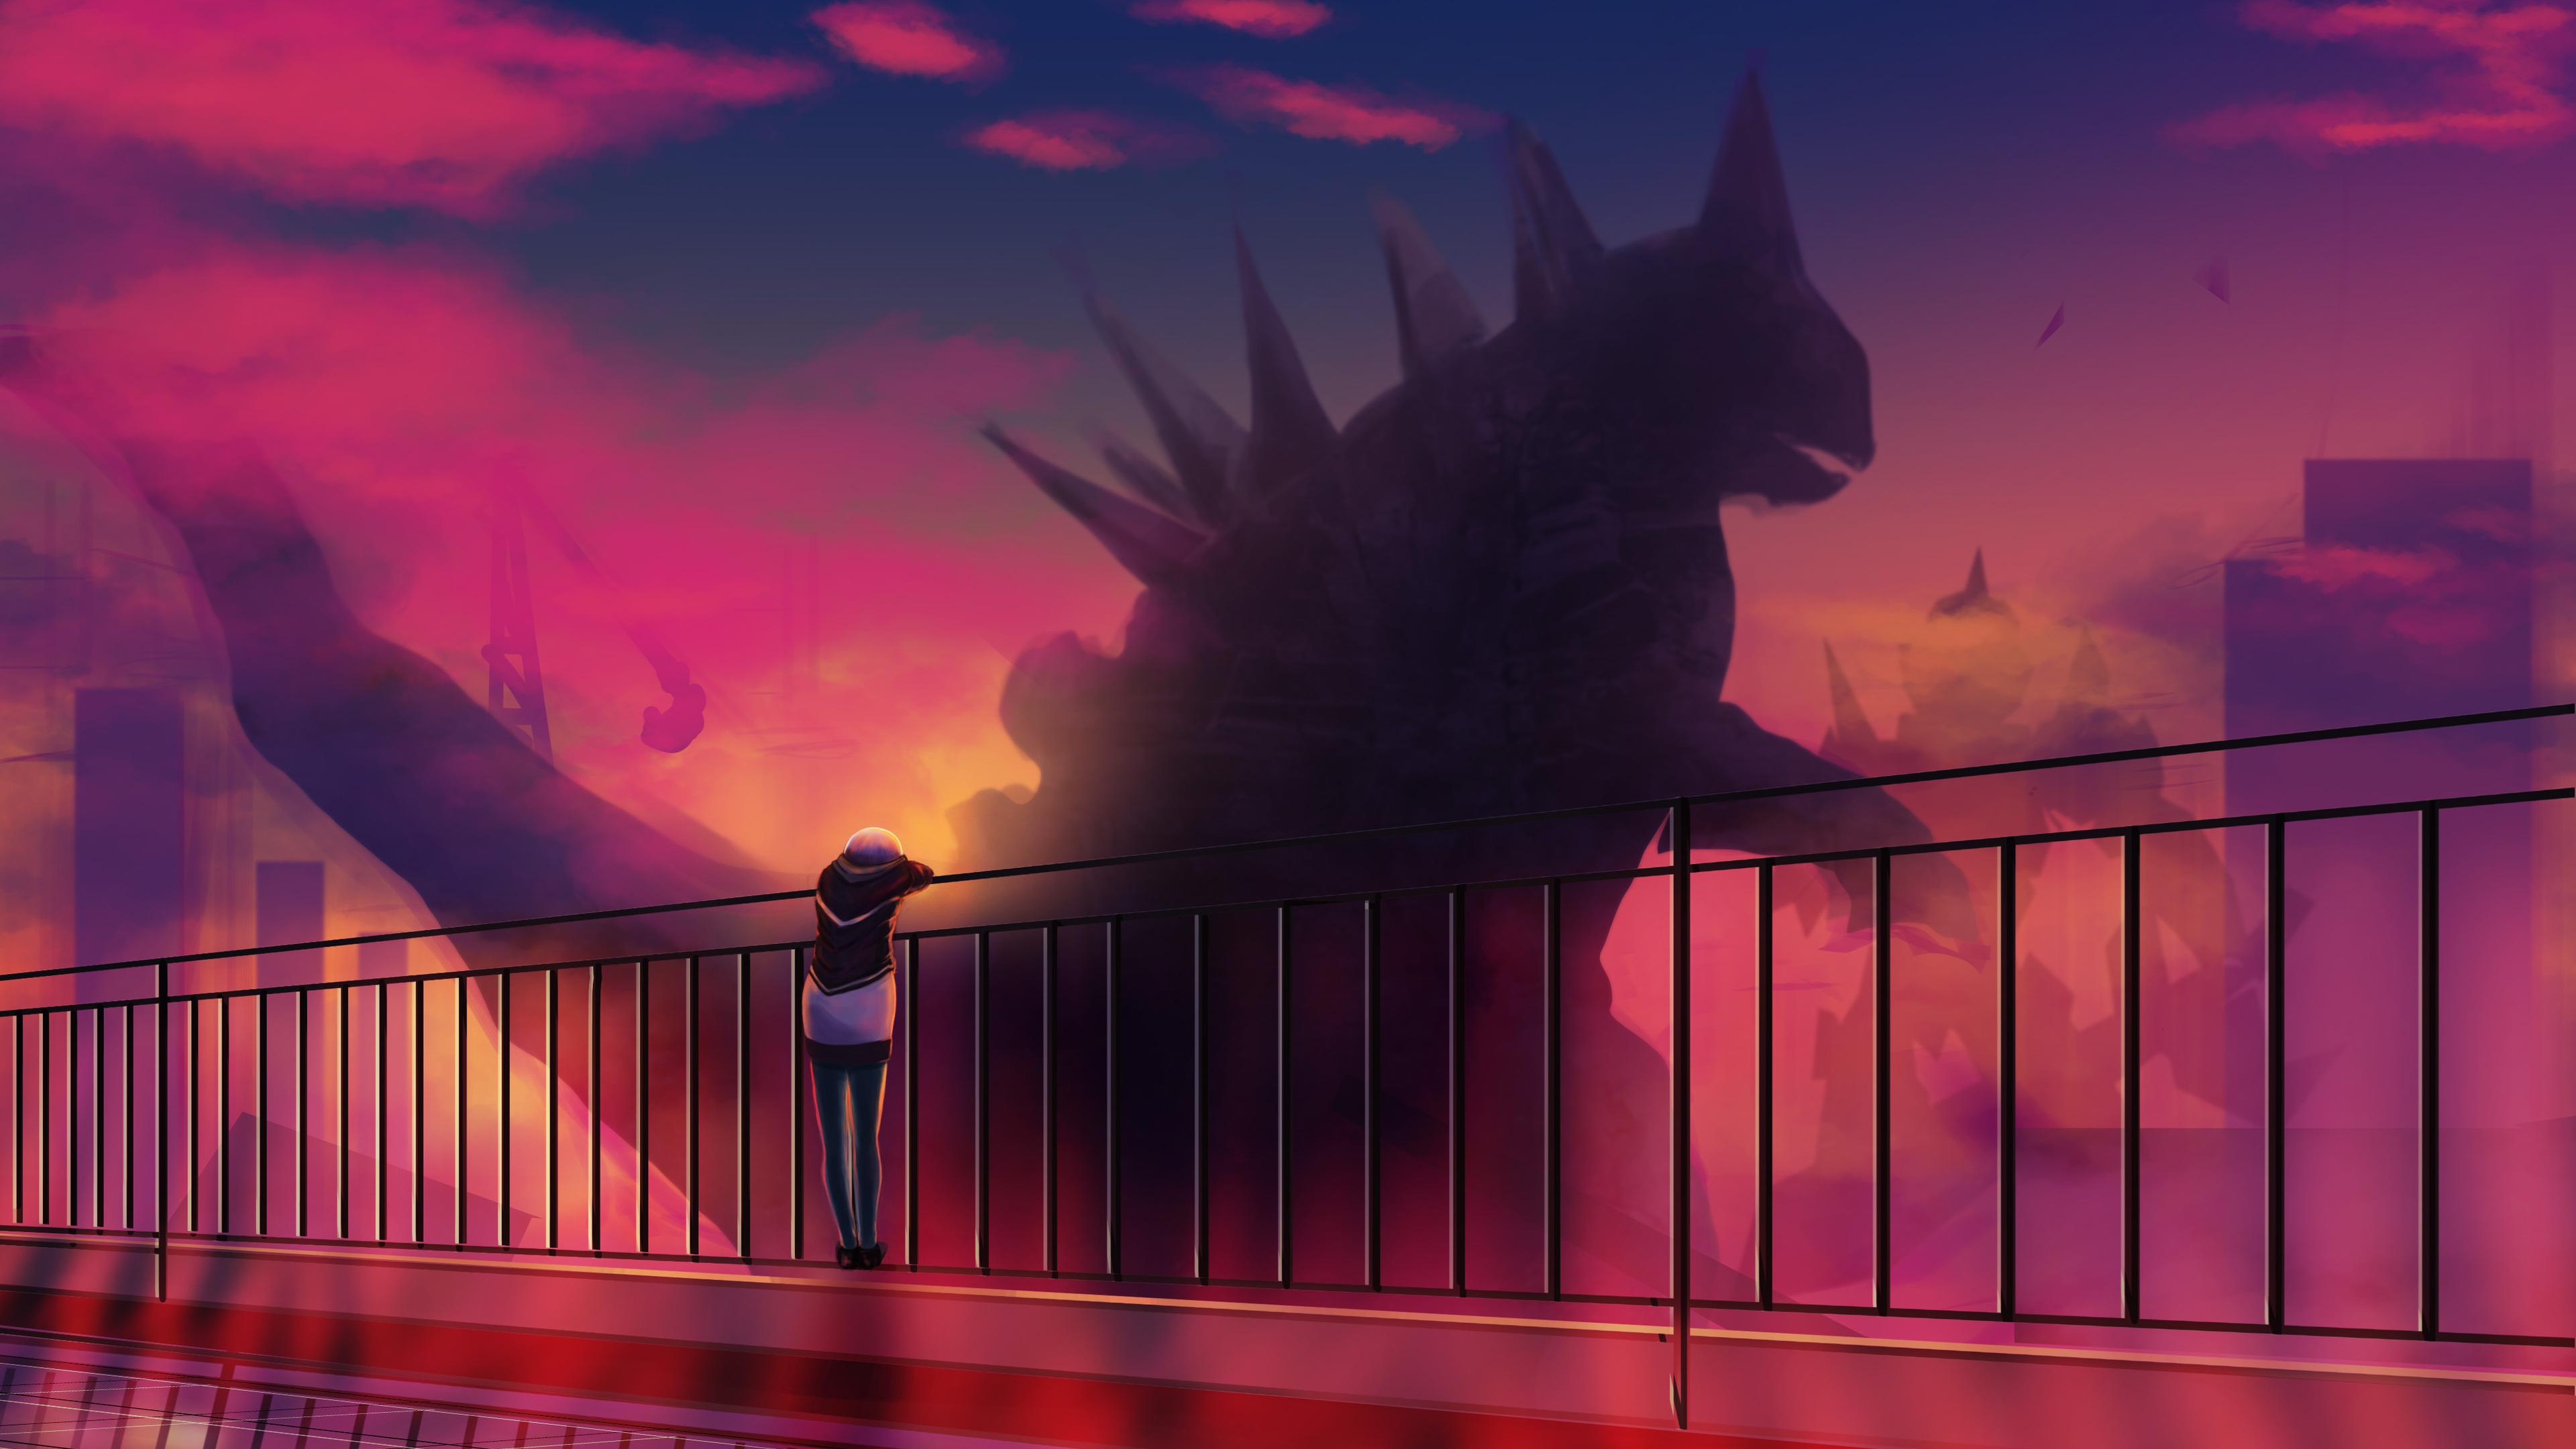 3840x2160 Akane Shinjou Anime 4k HD 4k Wallpapers, Images ...